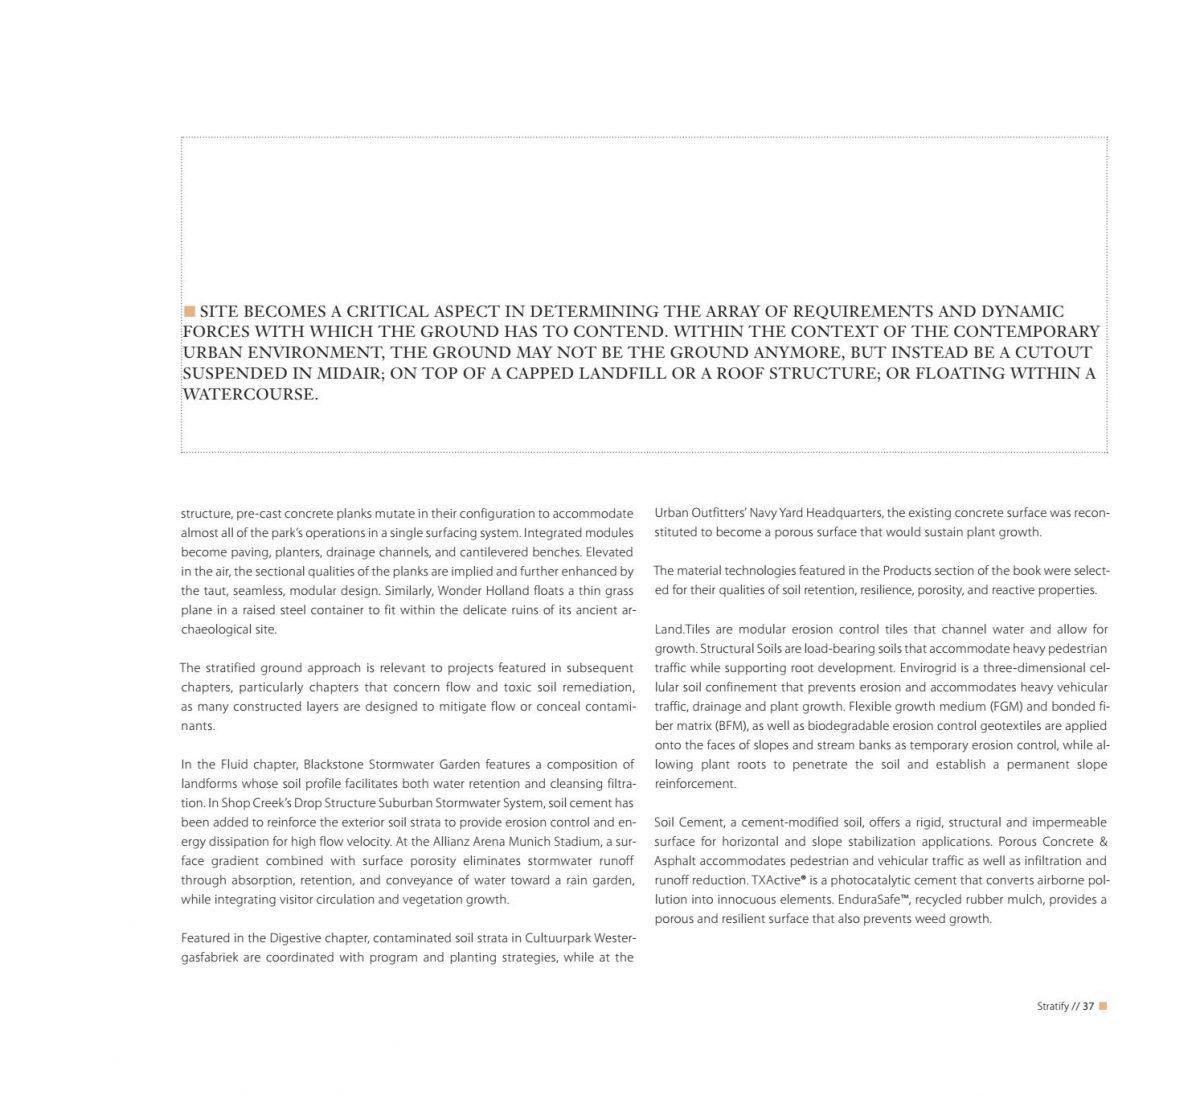 http://www.petkovstudio.com/bg/wp-content/uploads/2017/03/page_37-1200x1095.jpg